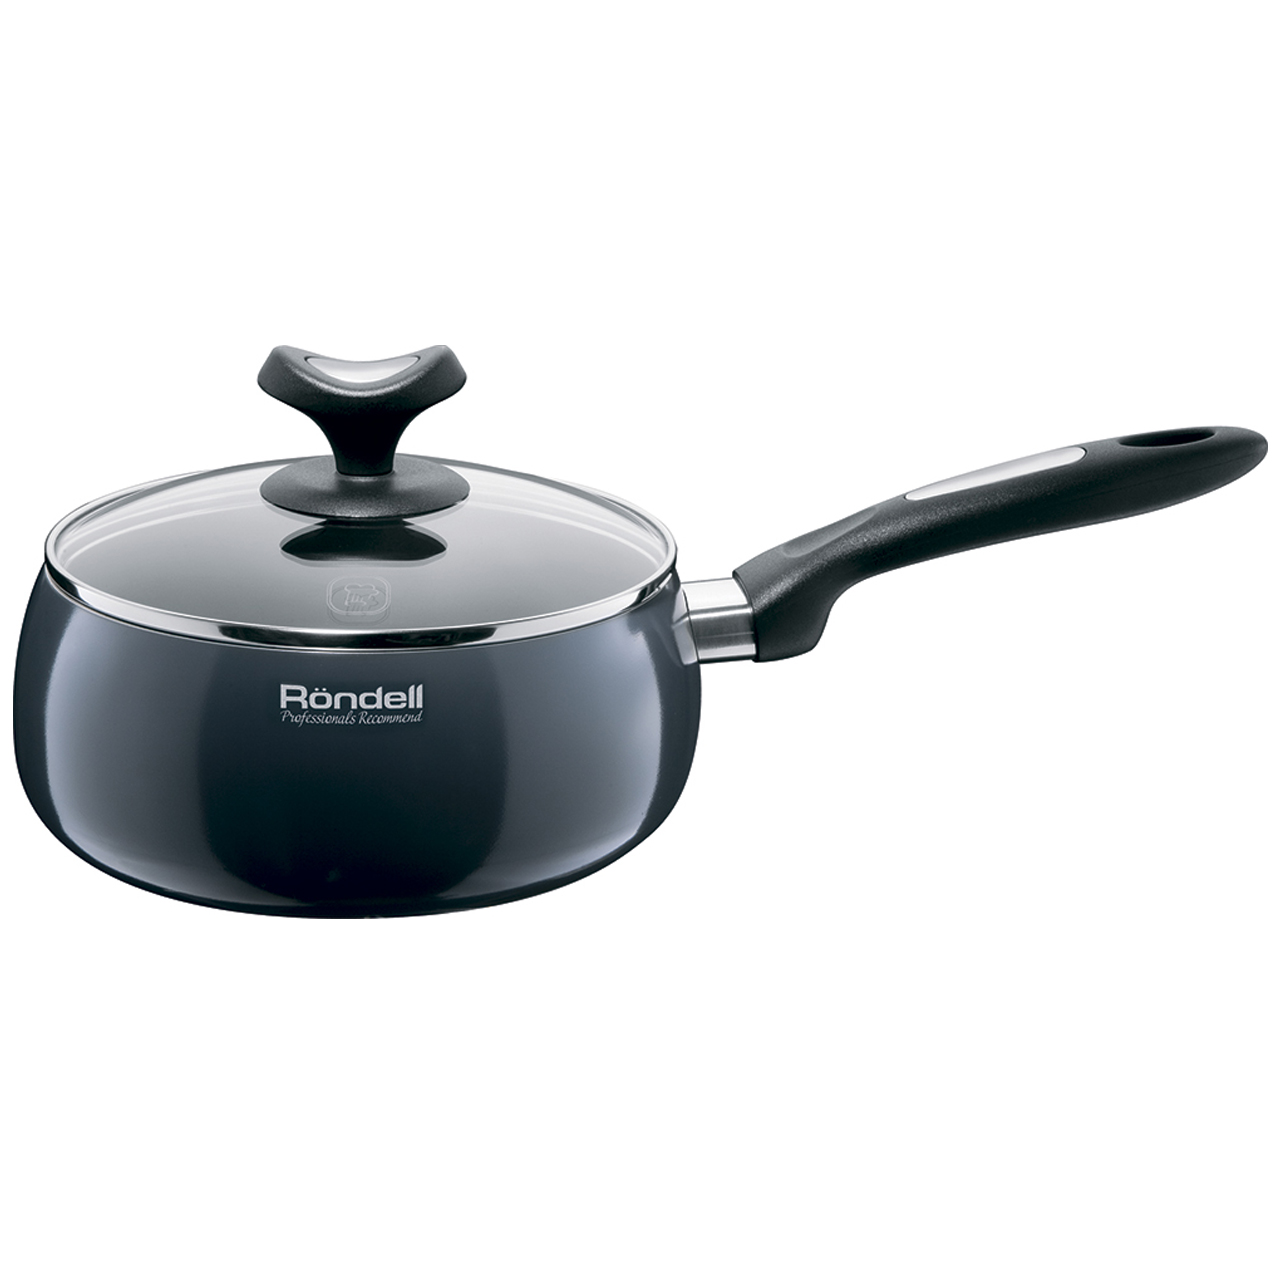 лучшая цена Bucket with lid Rondell Delice lid 18cm (2,5 l) RDA-080